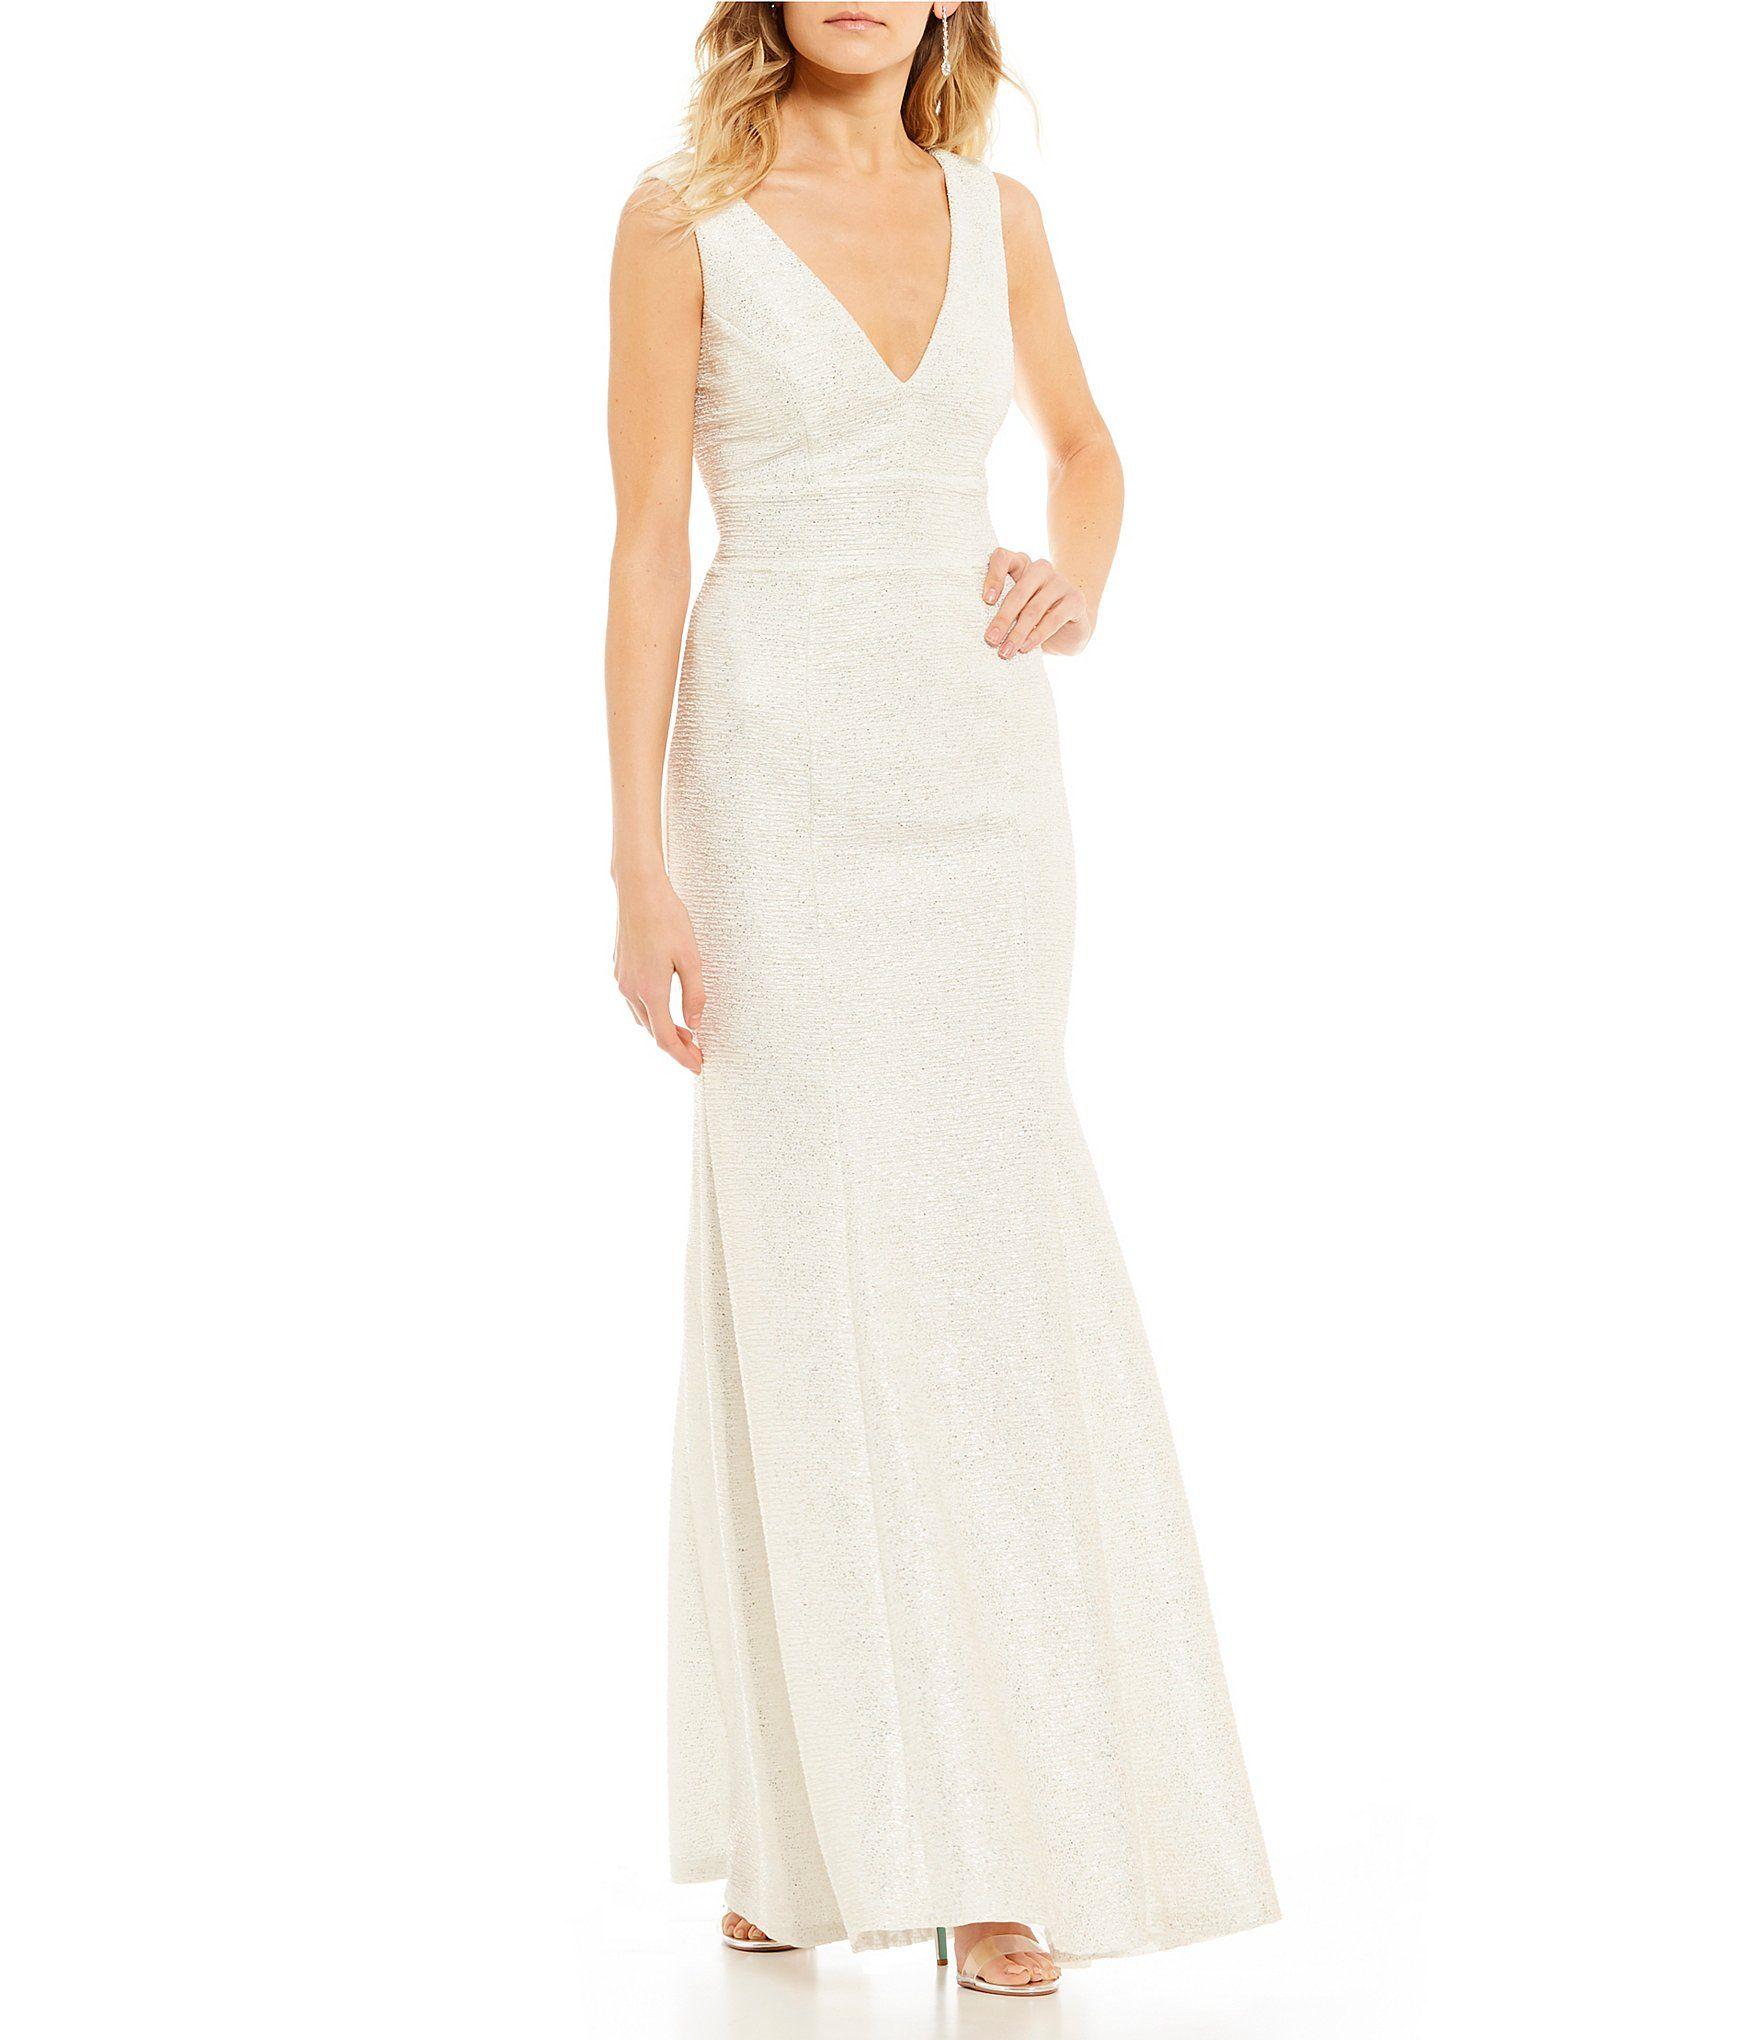 Xtraordinary foiledknit long dress dillards clothing accessories